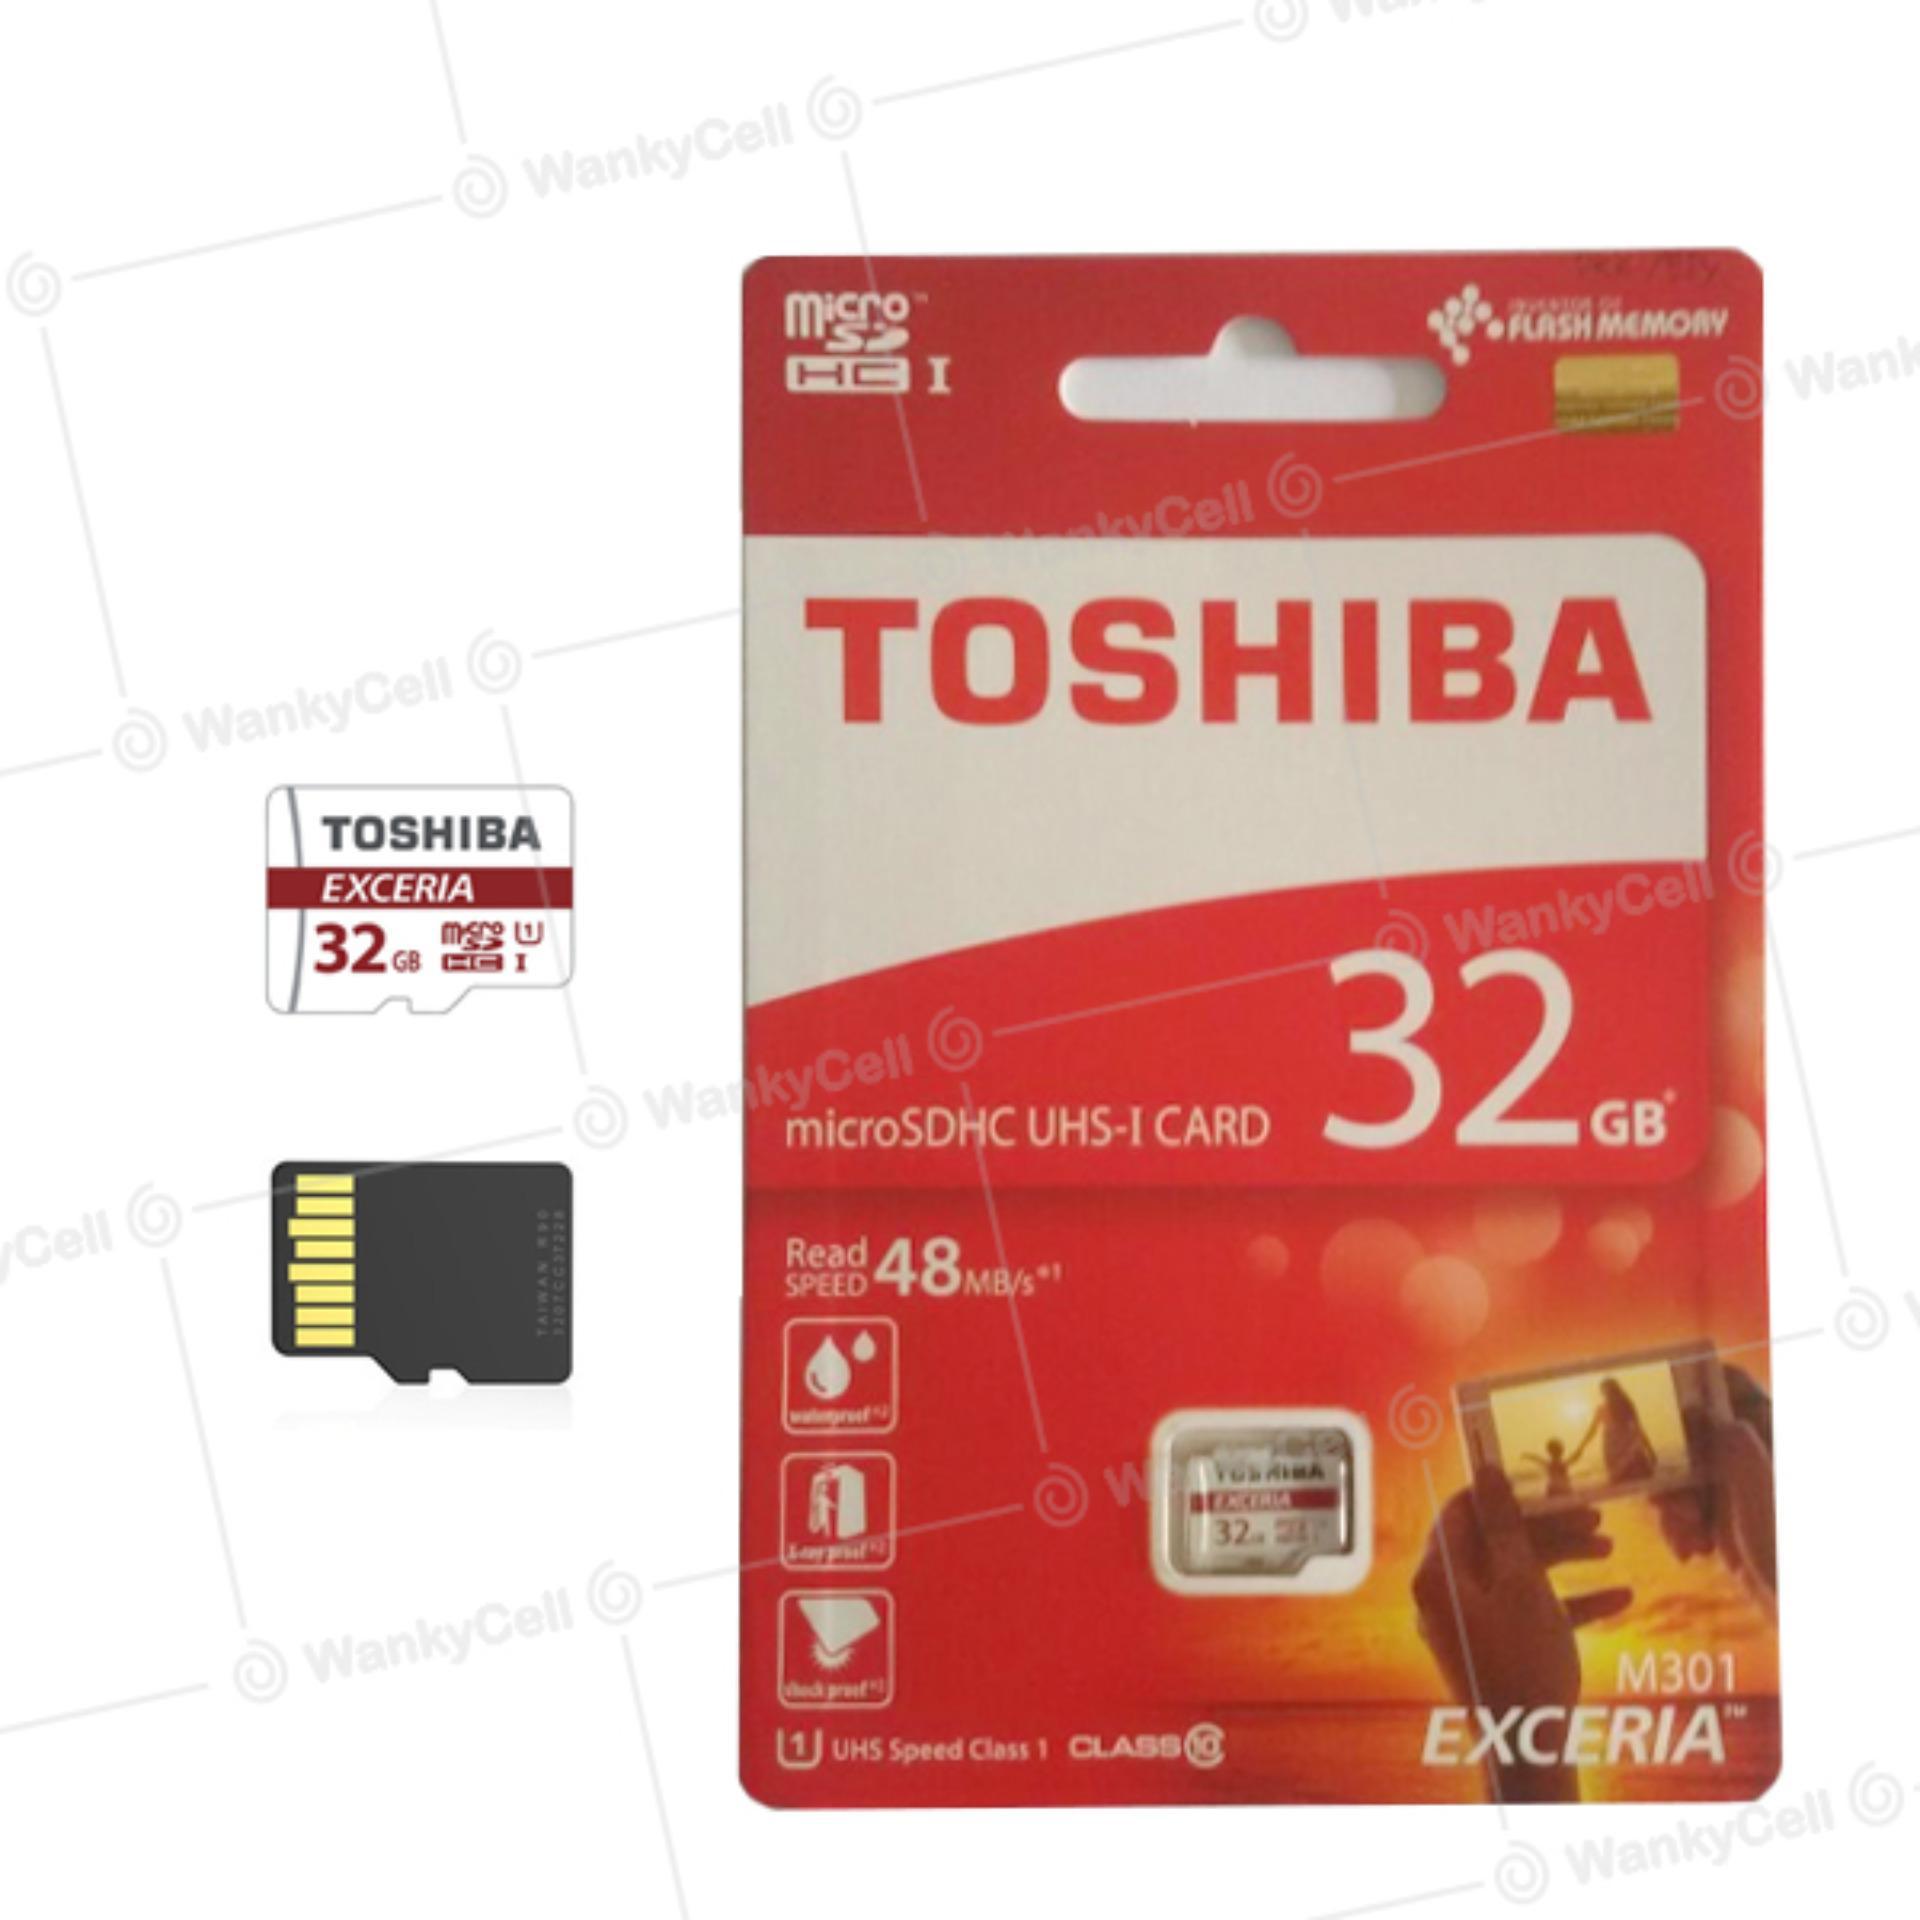 Miliki Segera Toshiba Microsdhc Speed 48Mb S Uhs I Card Non Adapter 32Gb